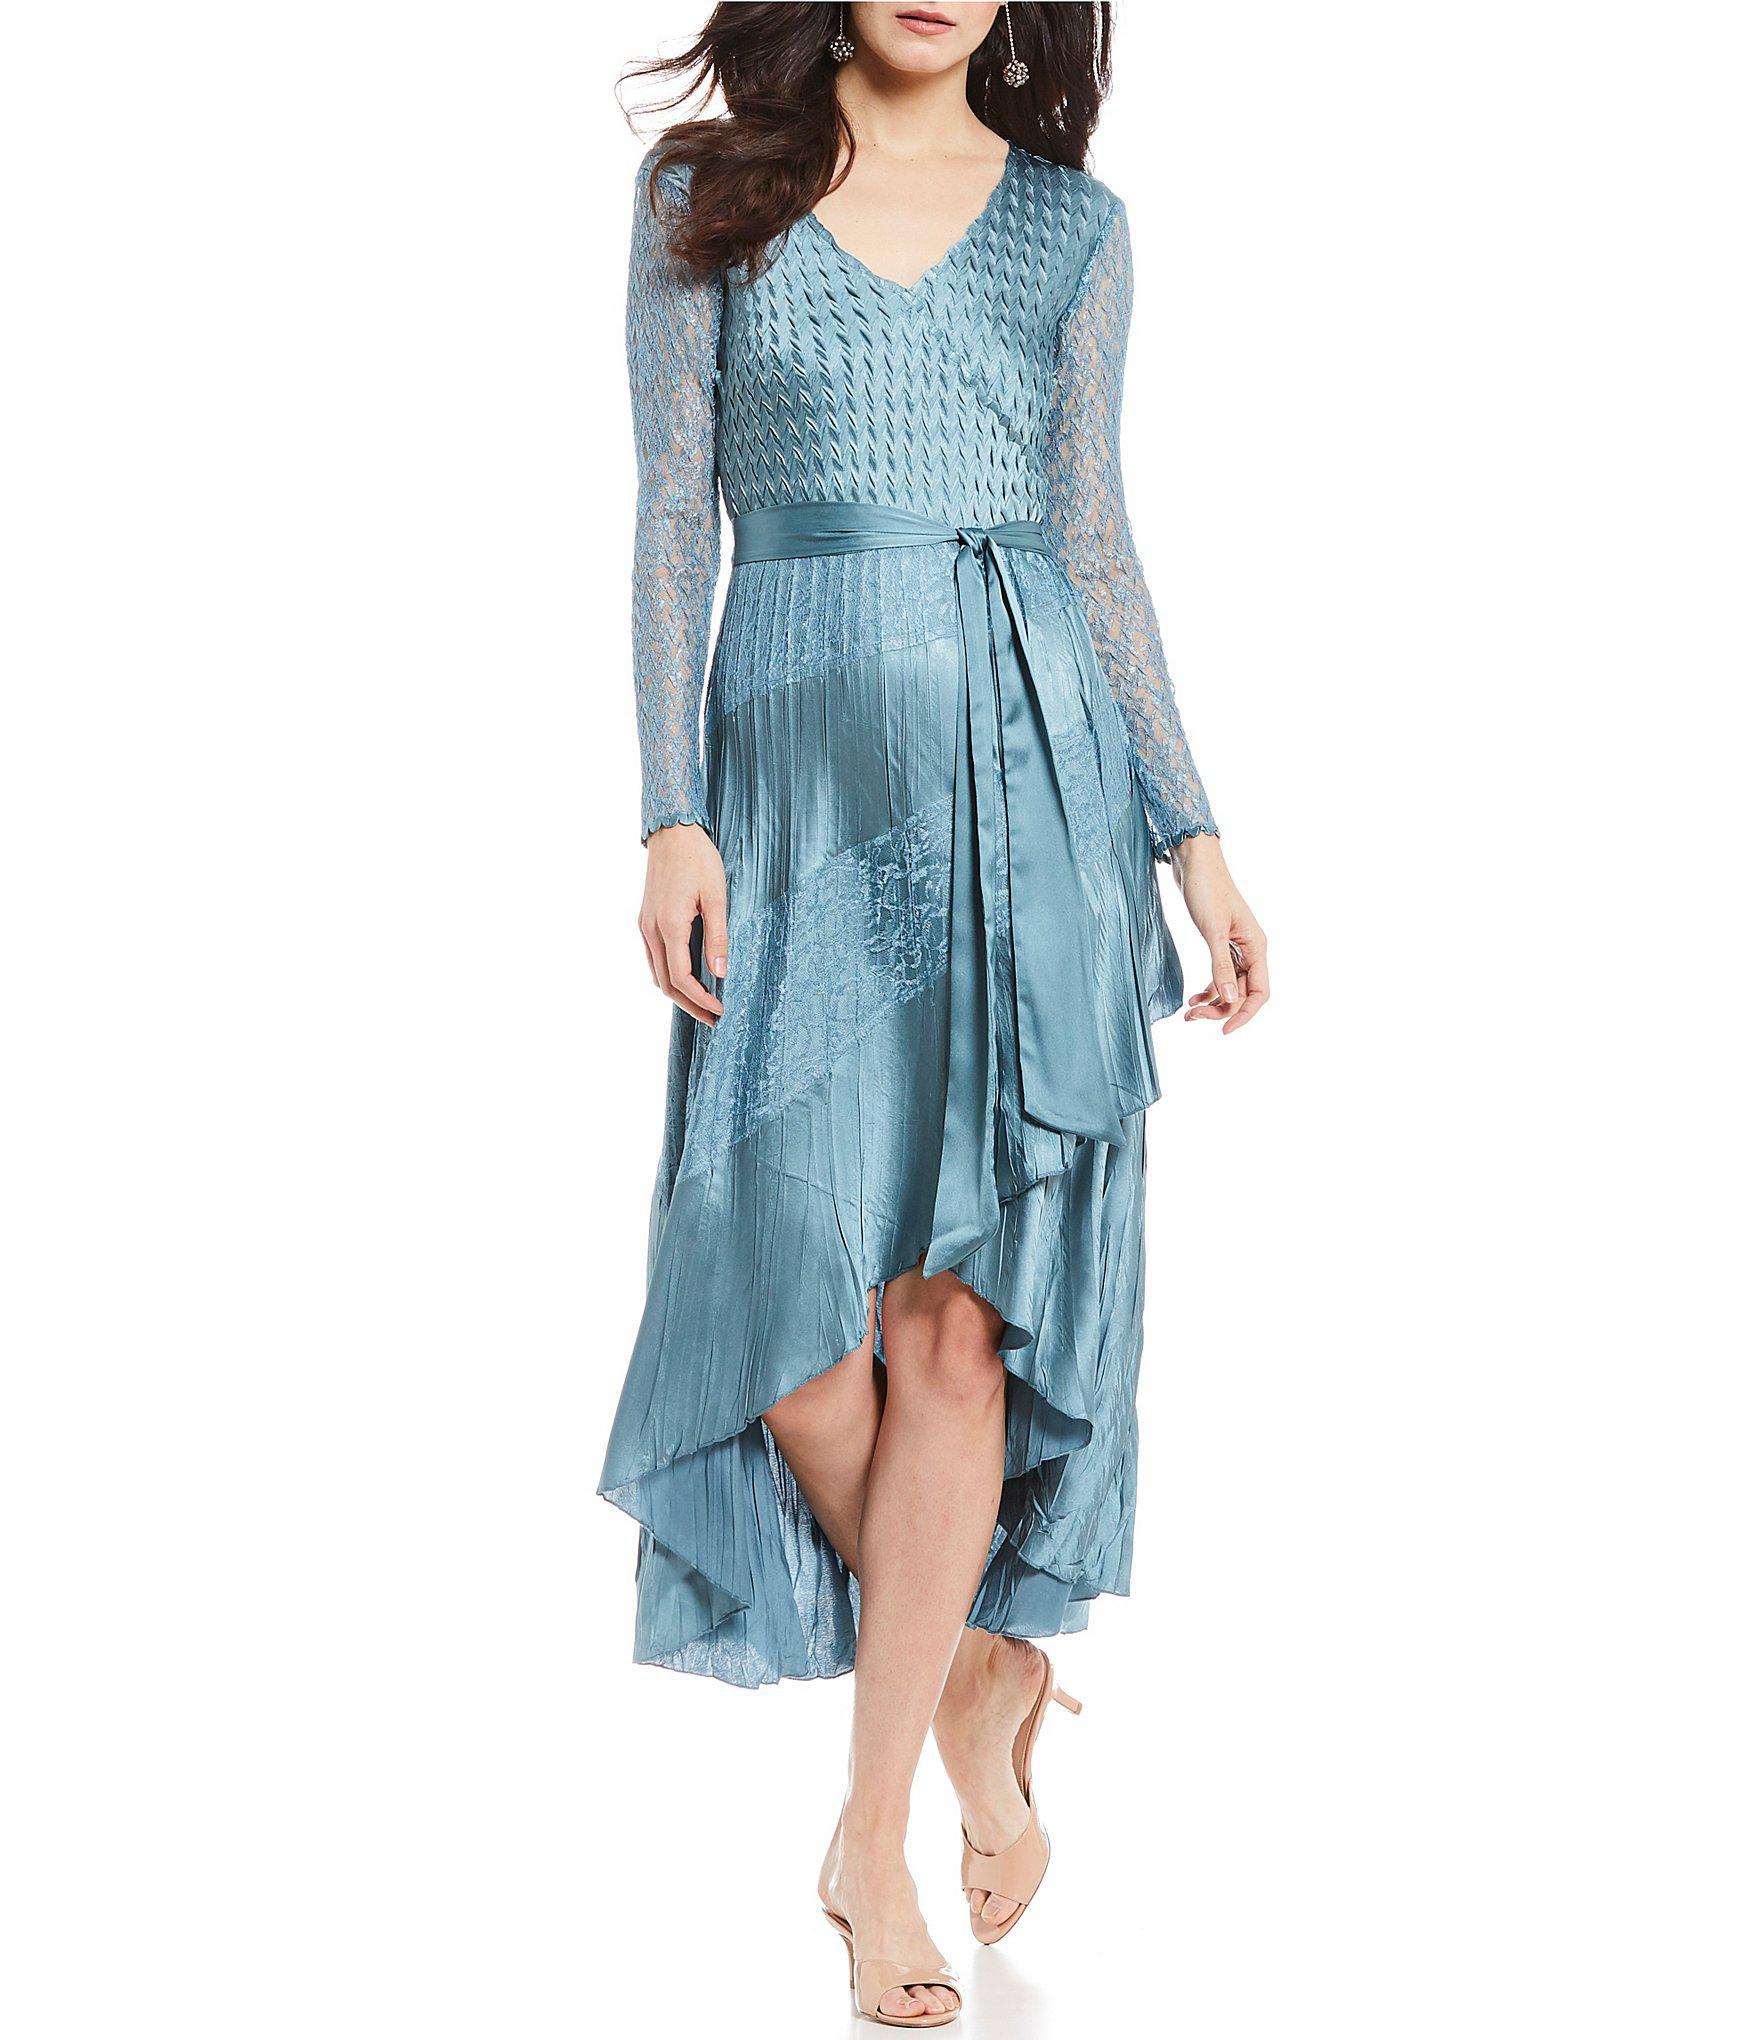 ee06279ed8 Komarov V Neck Faux Wrap Midi Dress in Blue - Lyst